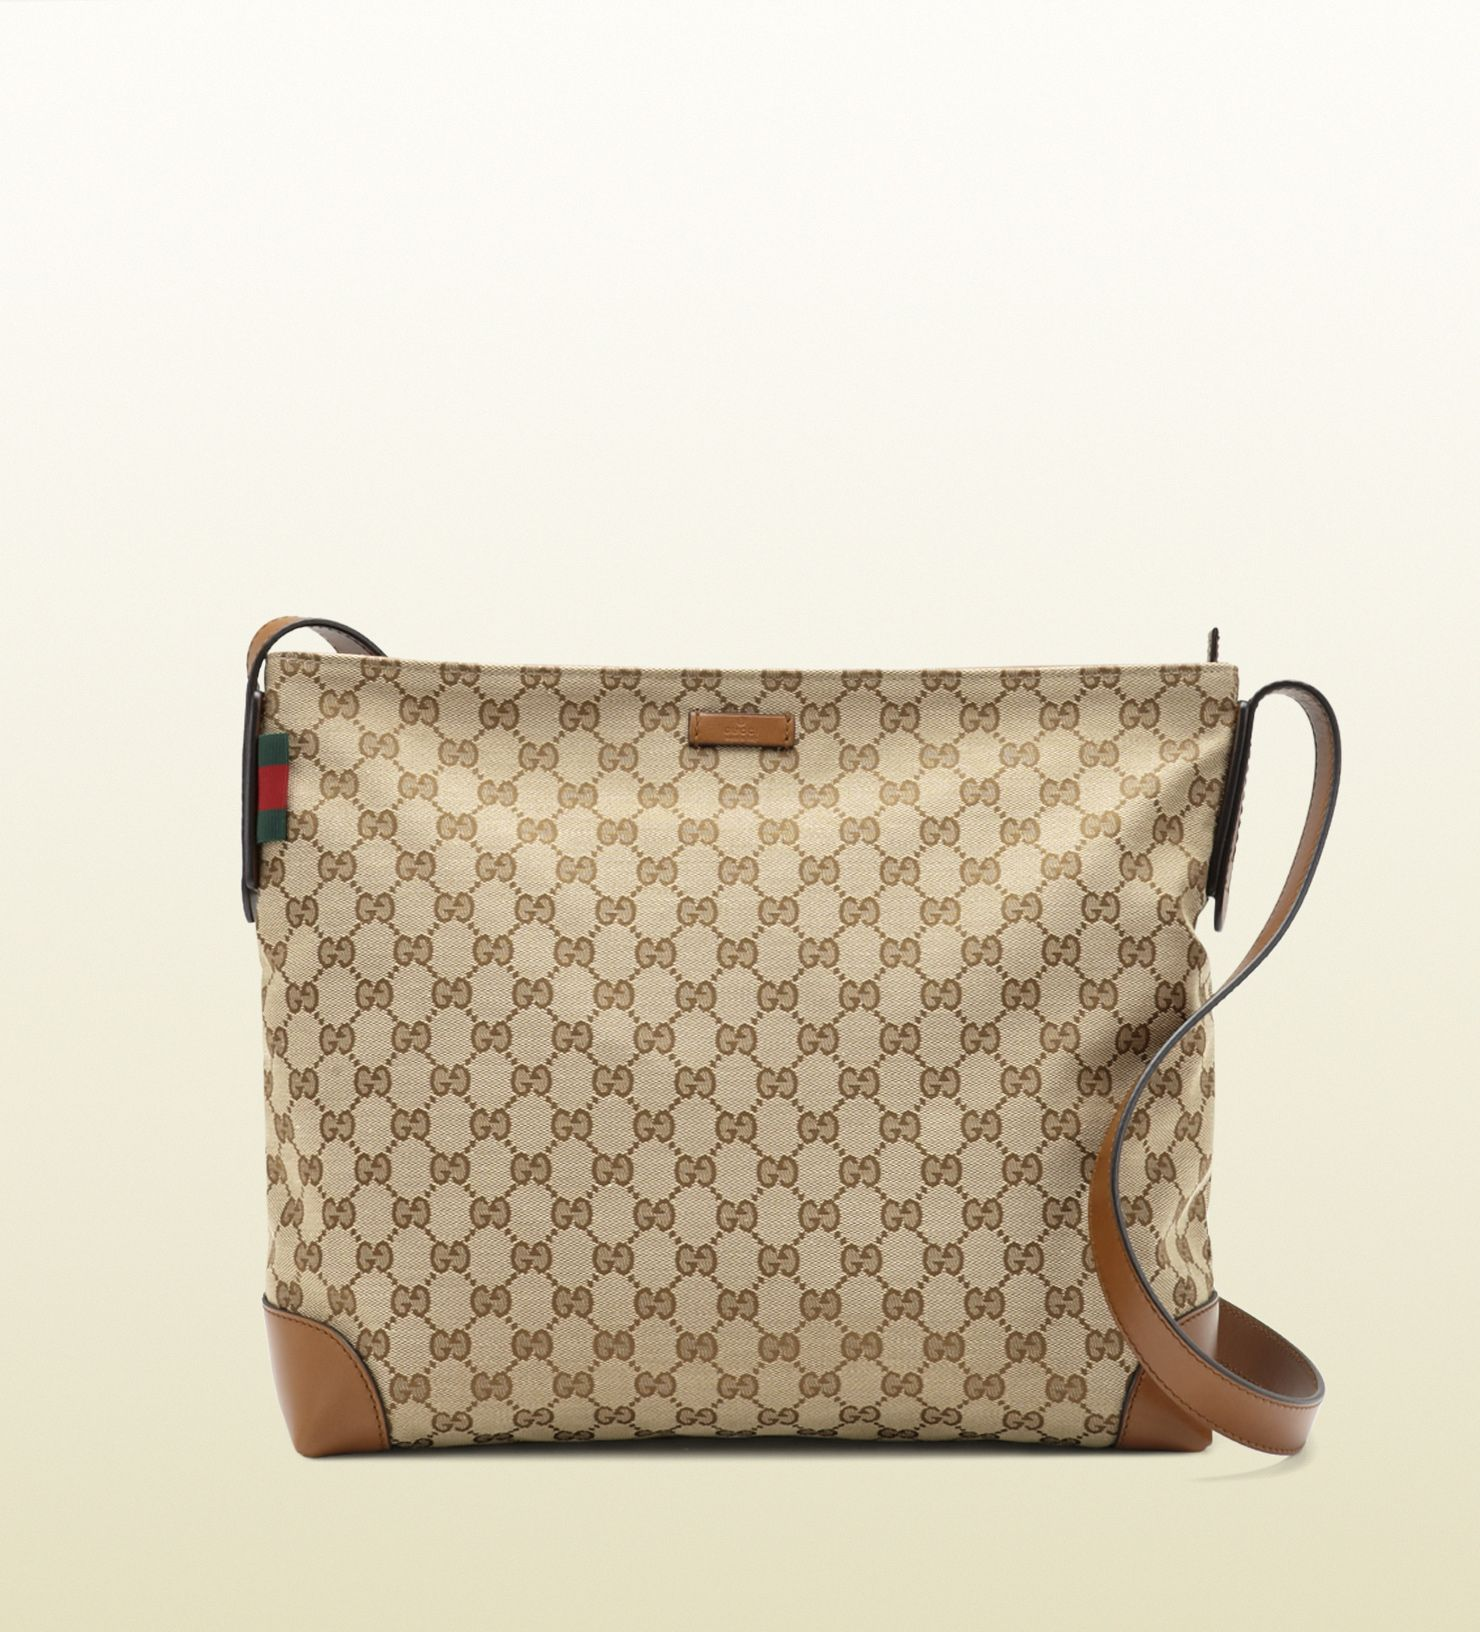 Gucci Large Original Gg Canvas Messenger Bag 308930f4csn8527